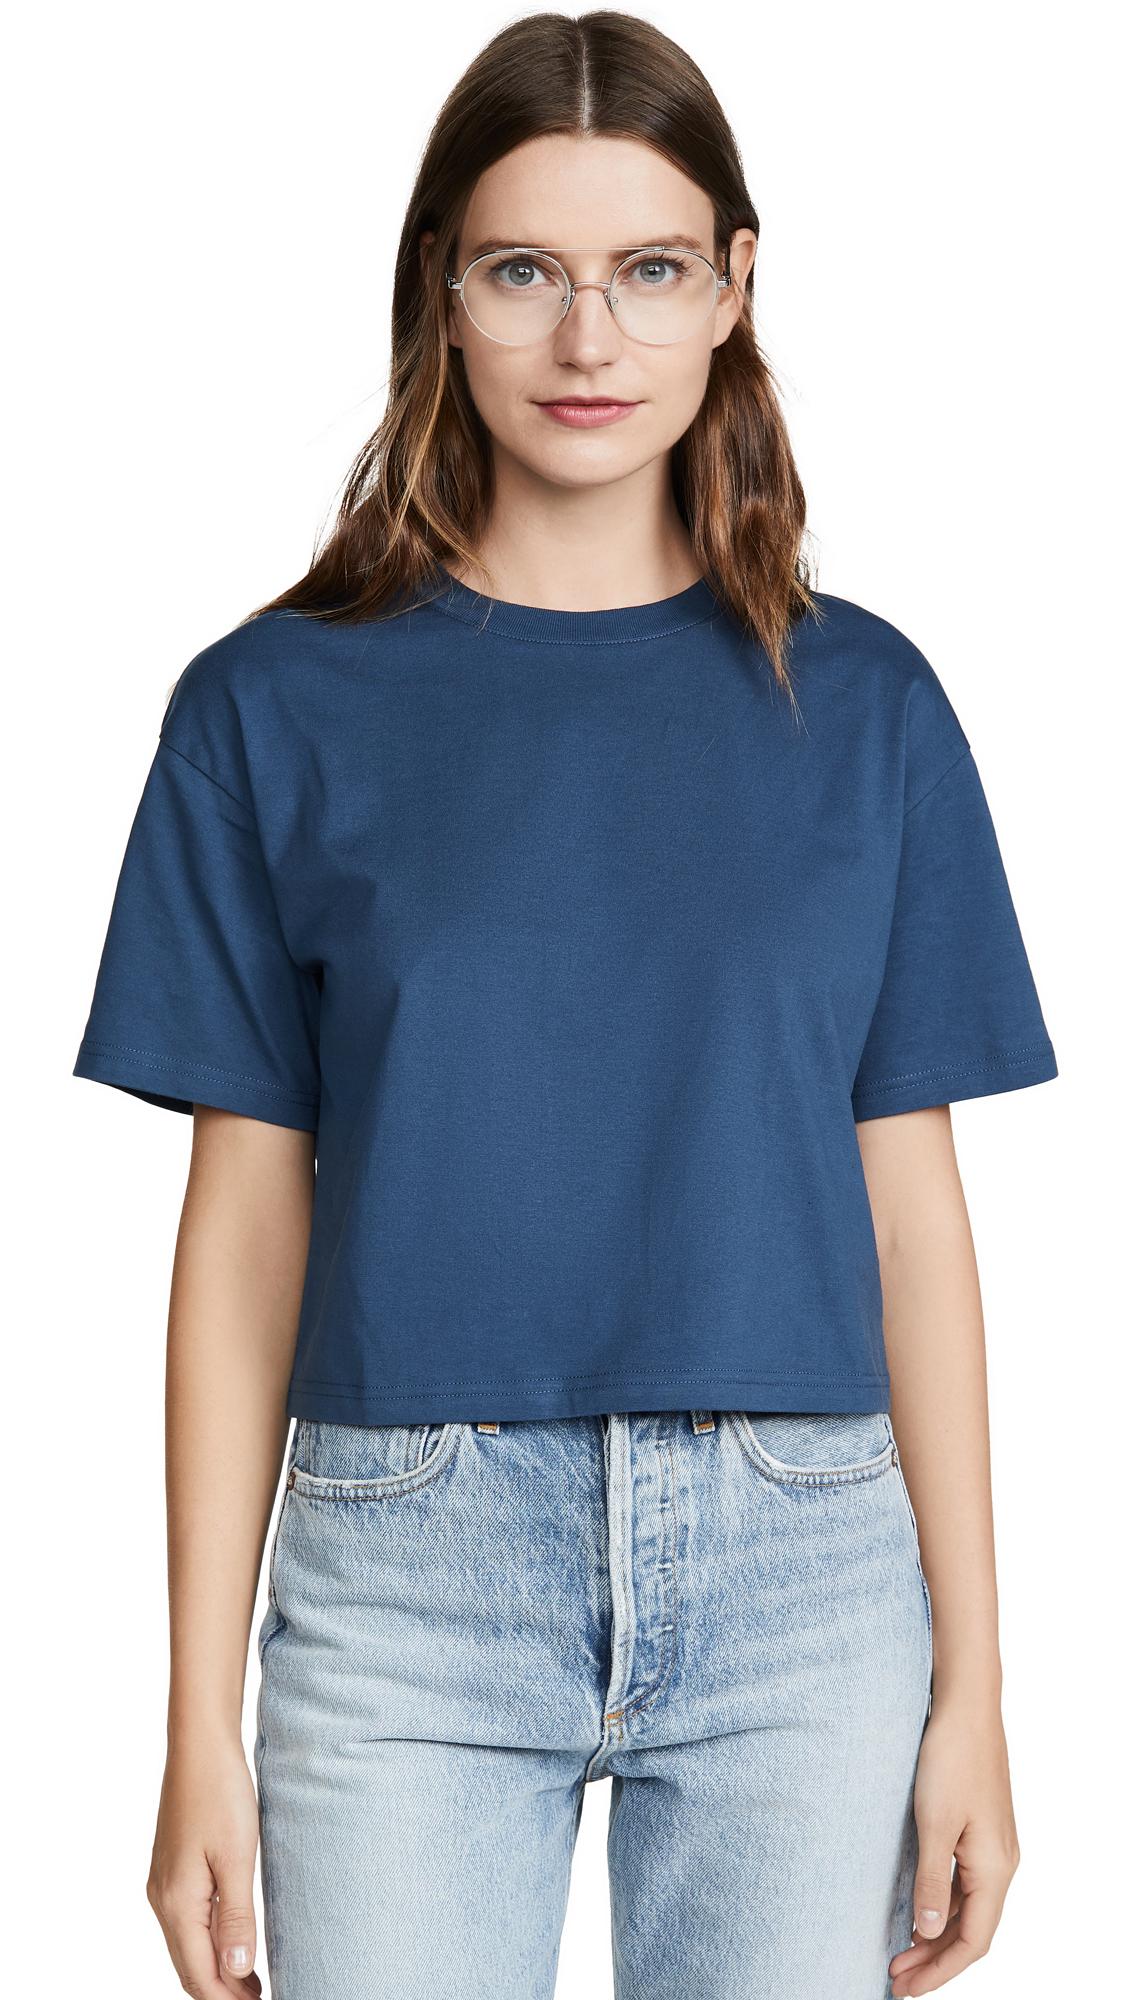 Acne Studios Elia Base T-Shirt - Teal Blue